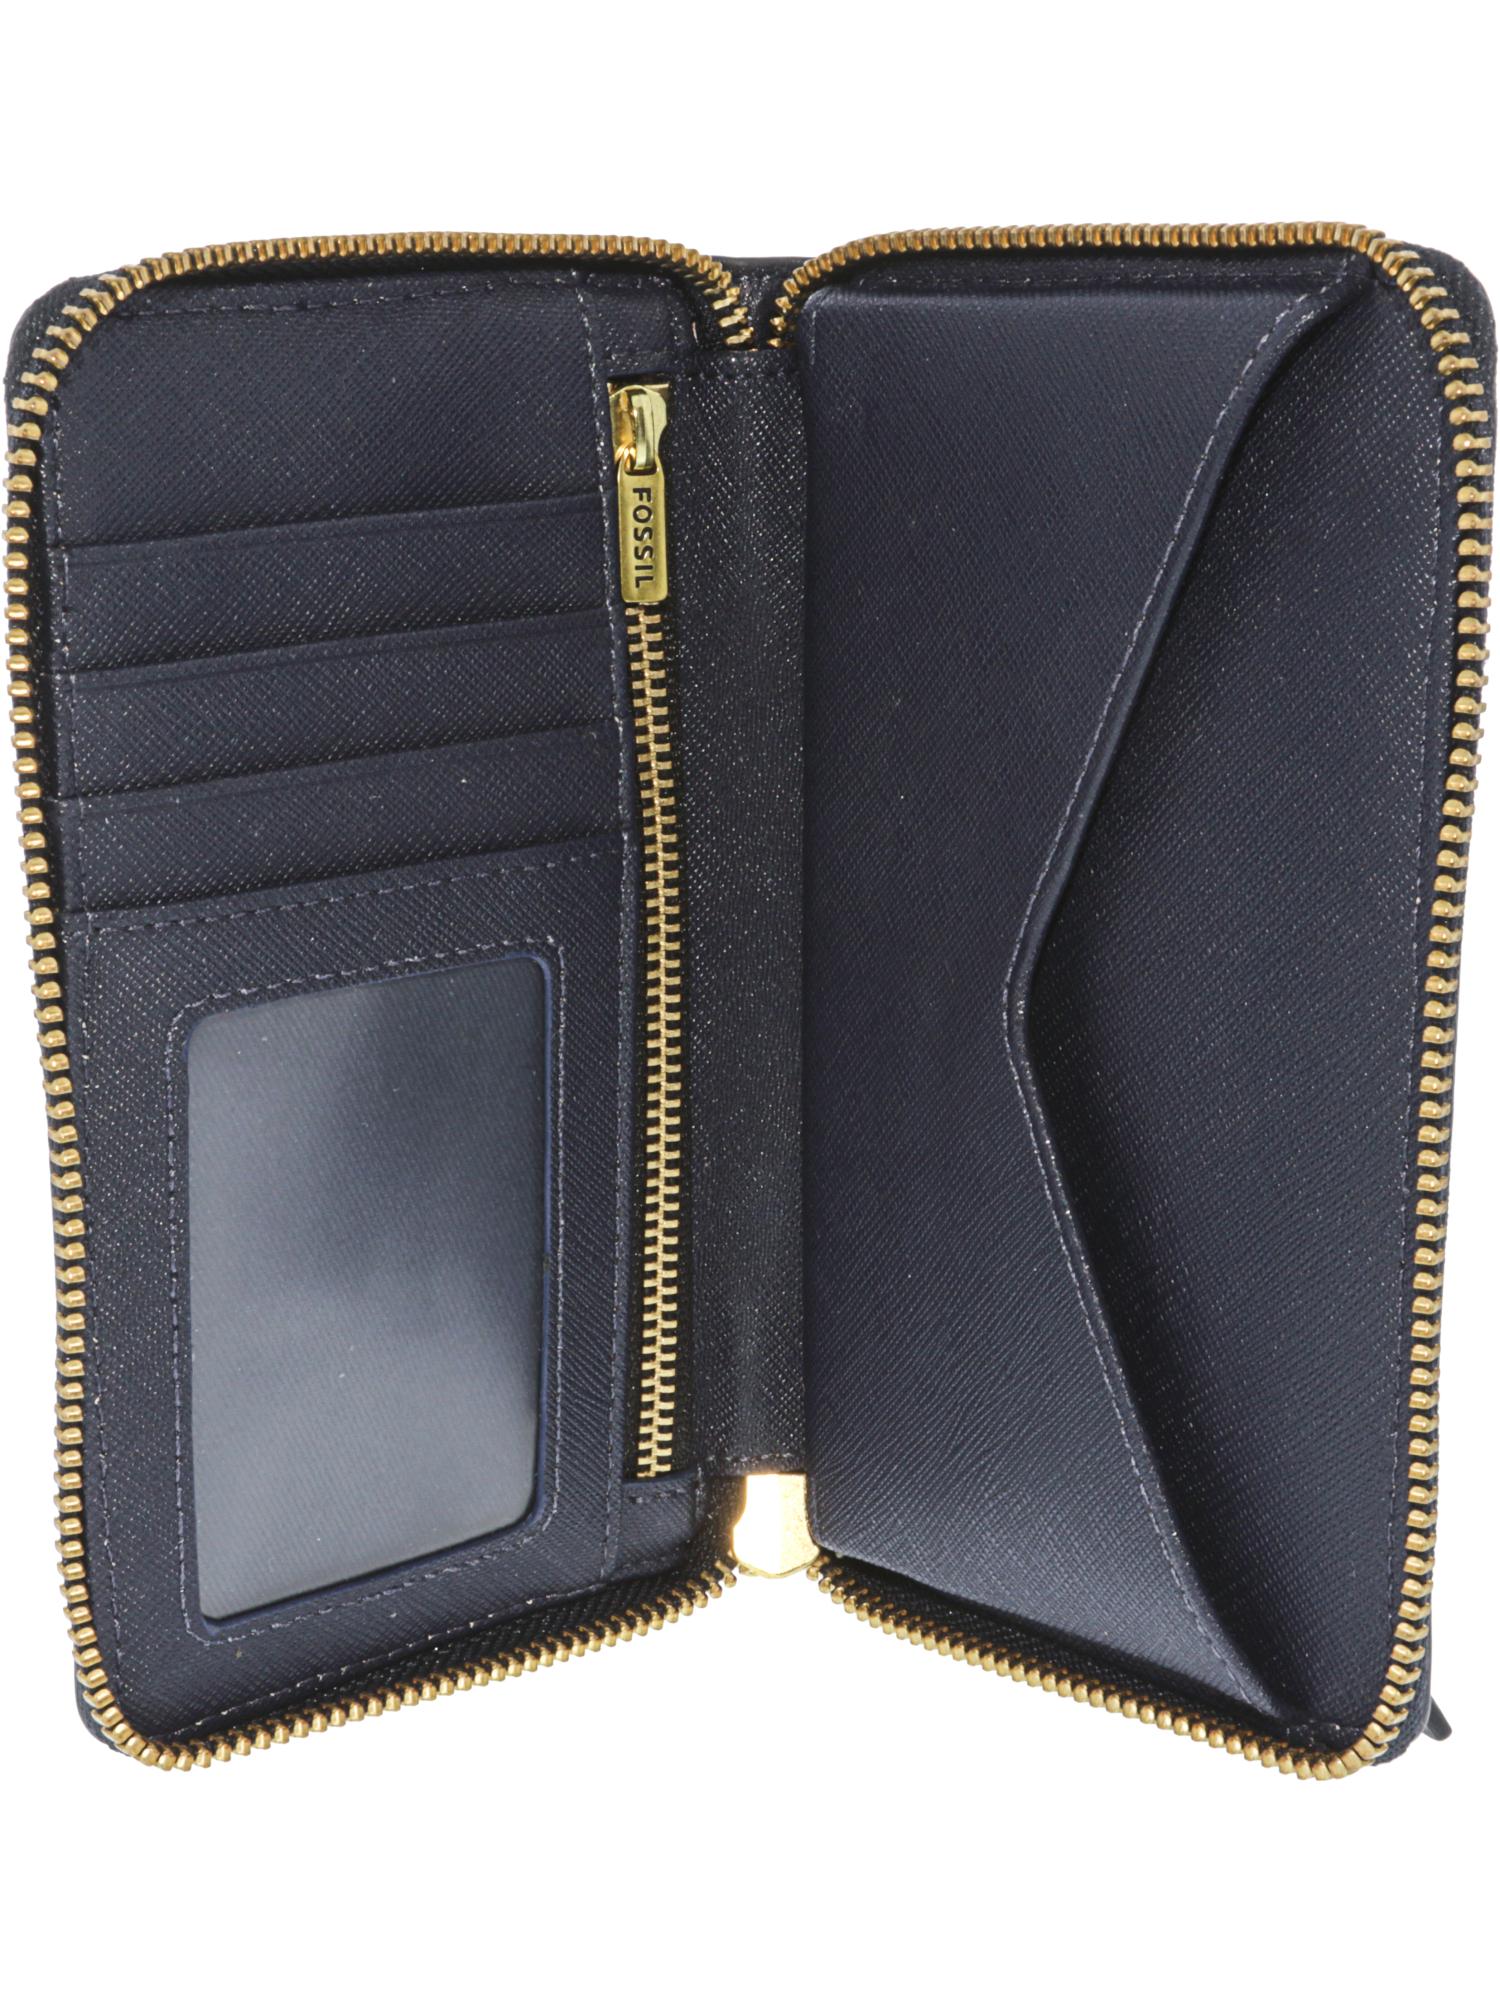 Fossil-Women-039-s-Emma-Smartphone-Wallet-Leather-Wristlet thumbnail 8